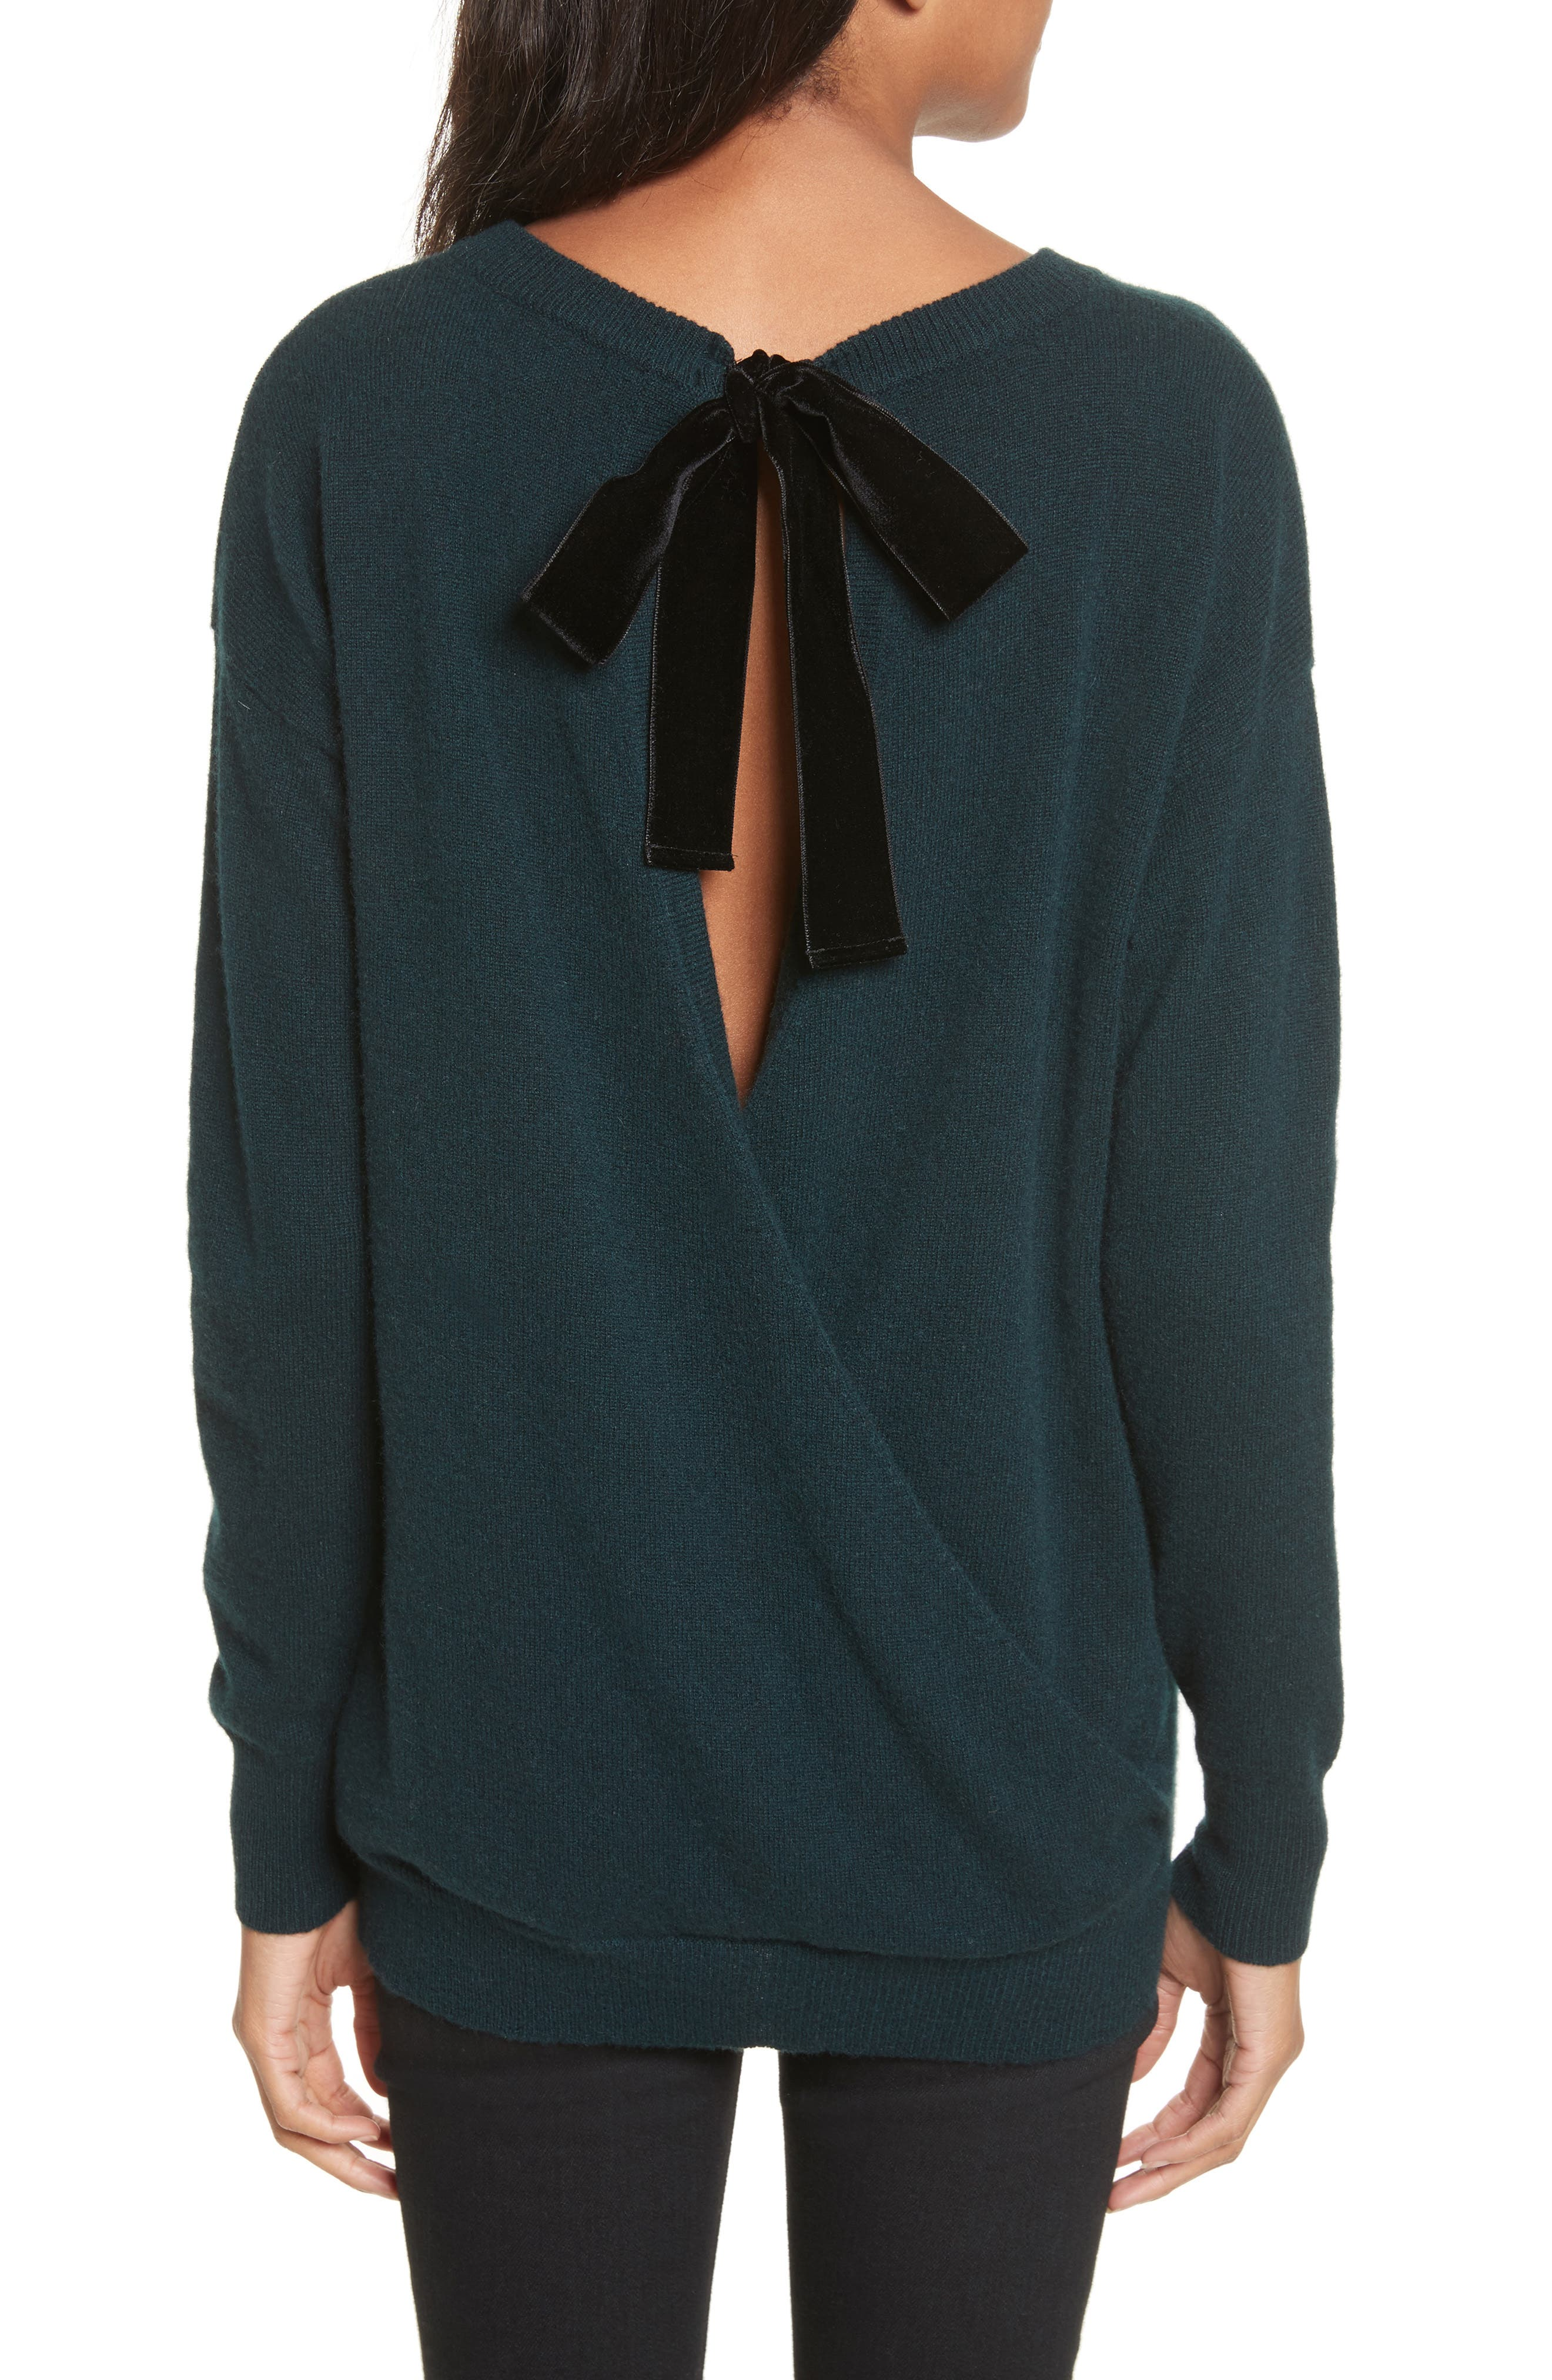 Velvet Tie Cashmere Sweater,                             Alternate thumbnail 2, color,                             320